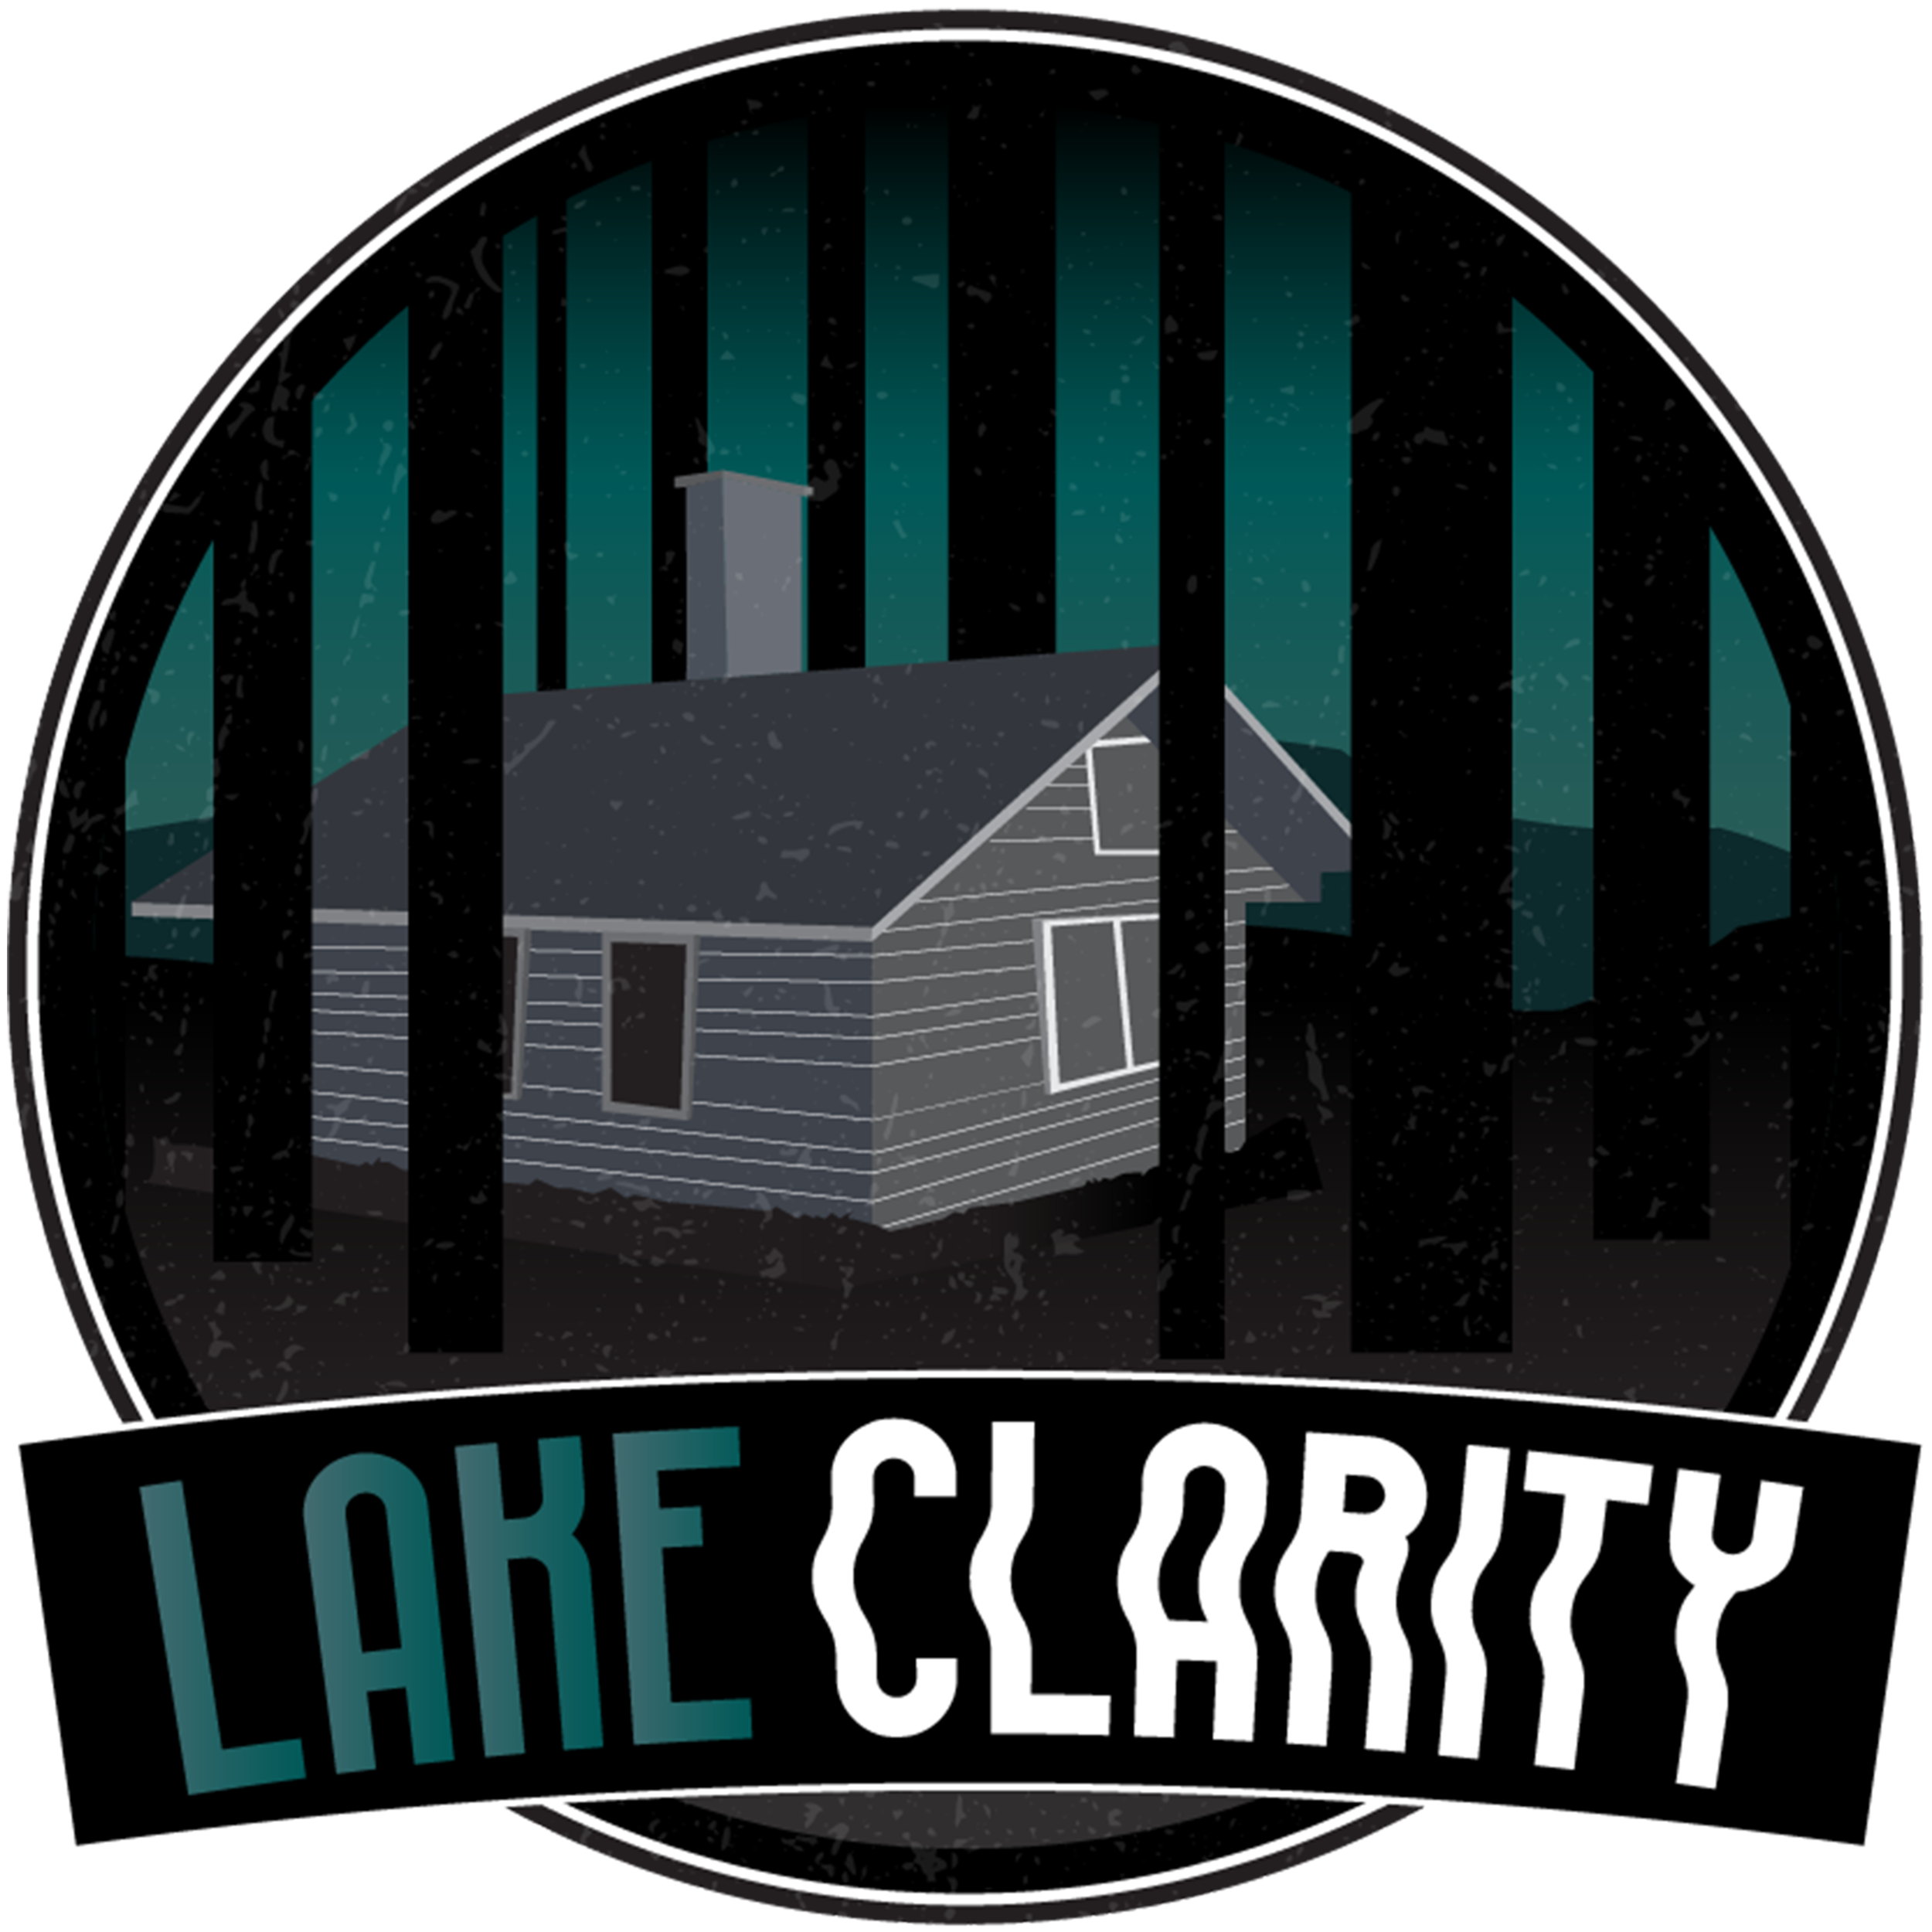 LC logo large 2.png